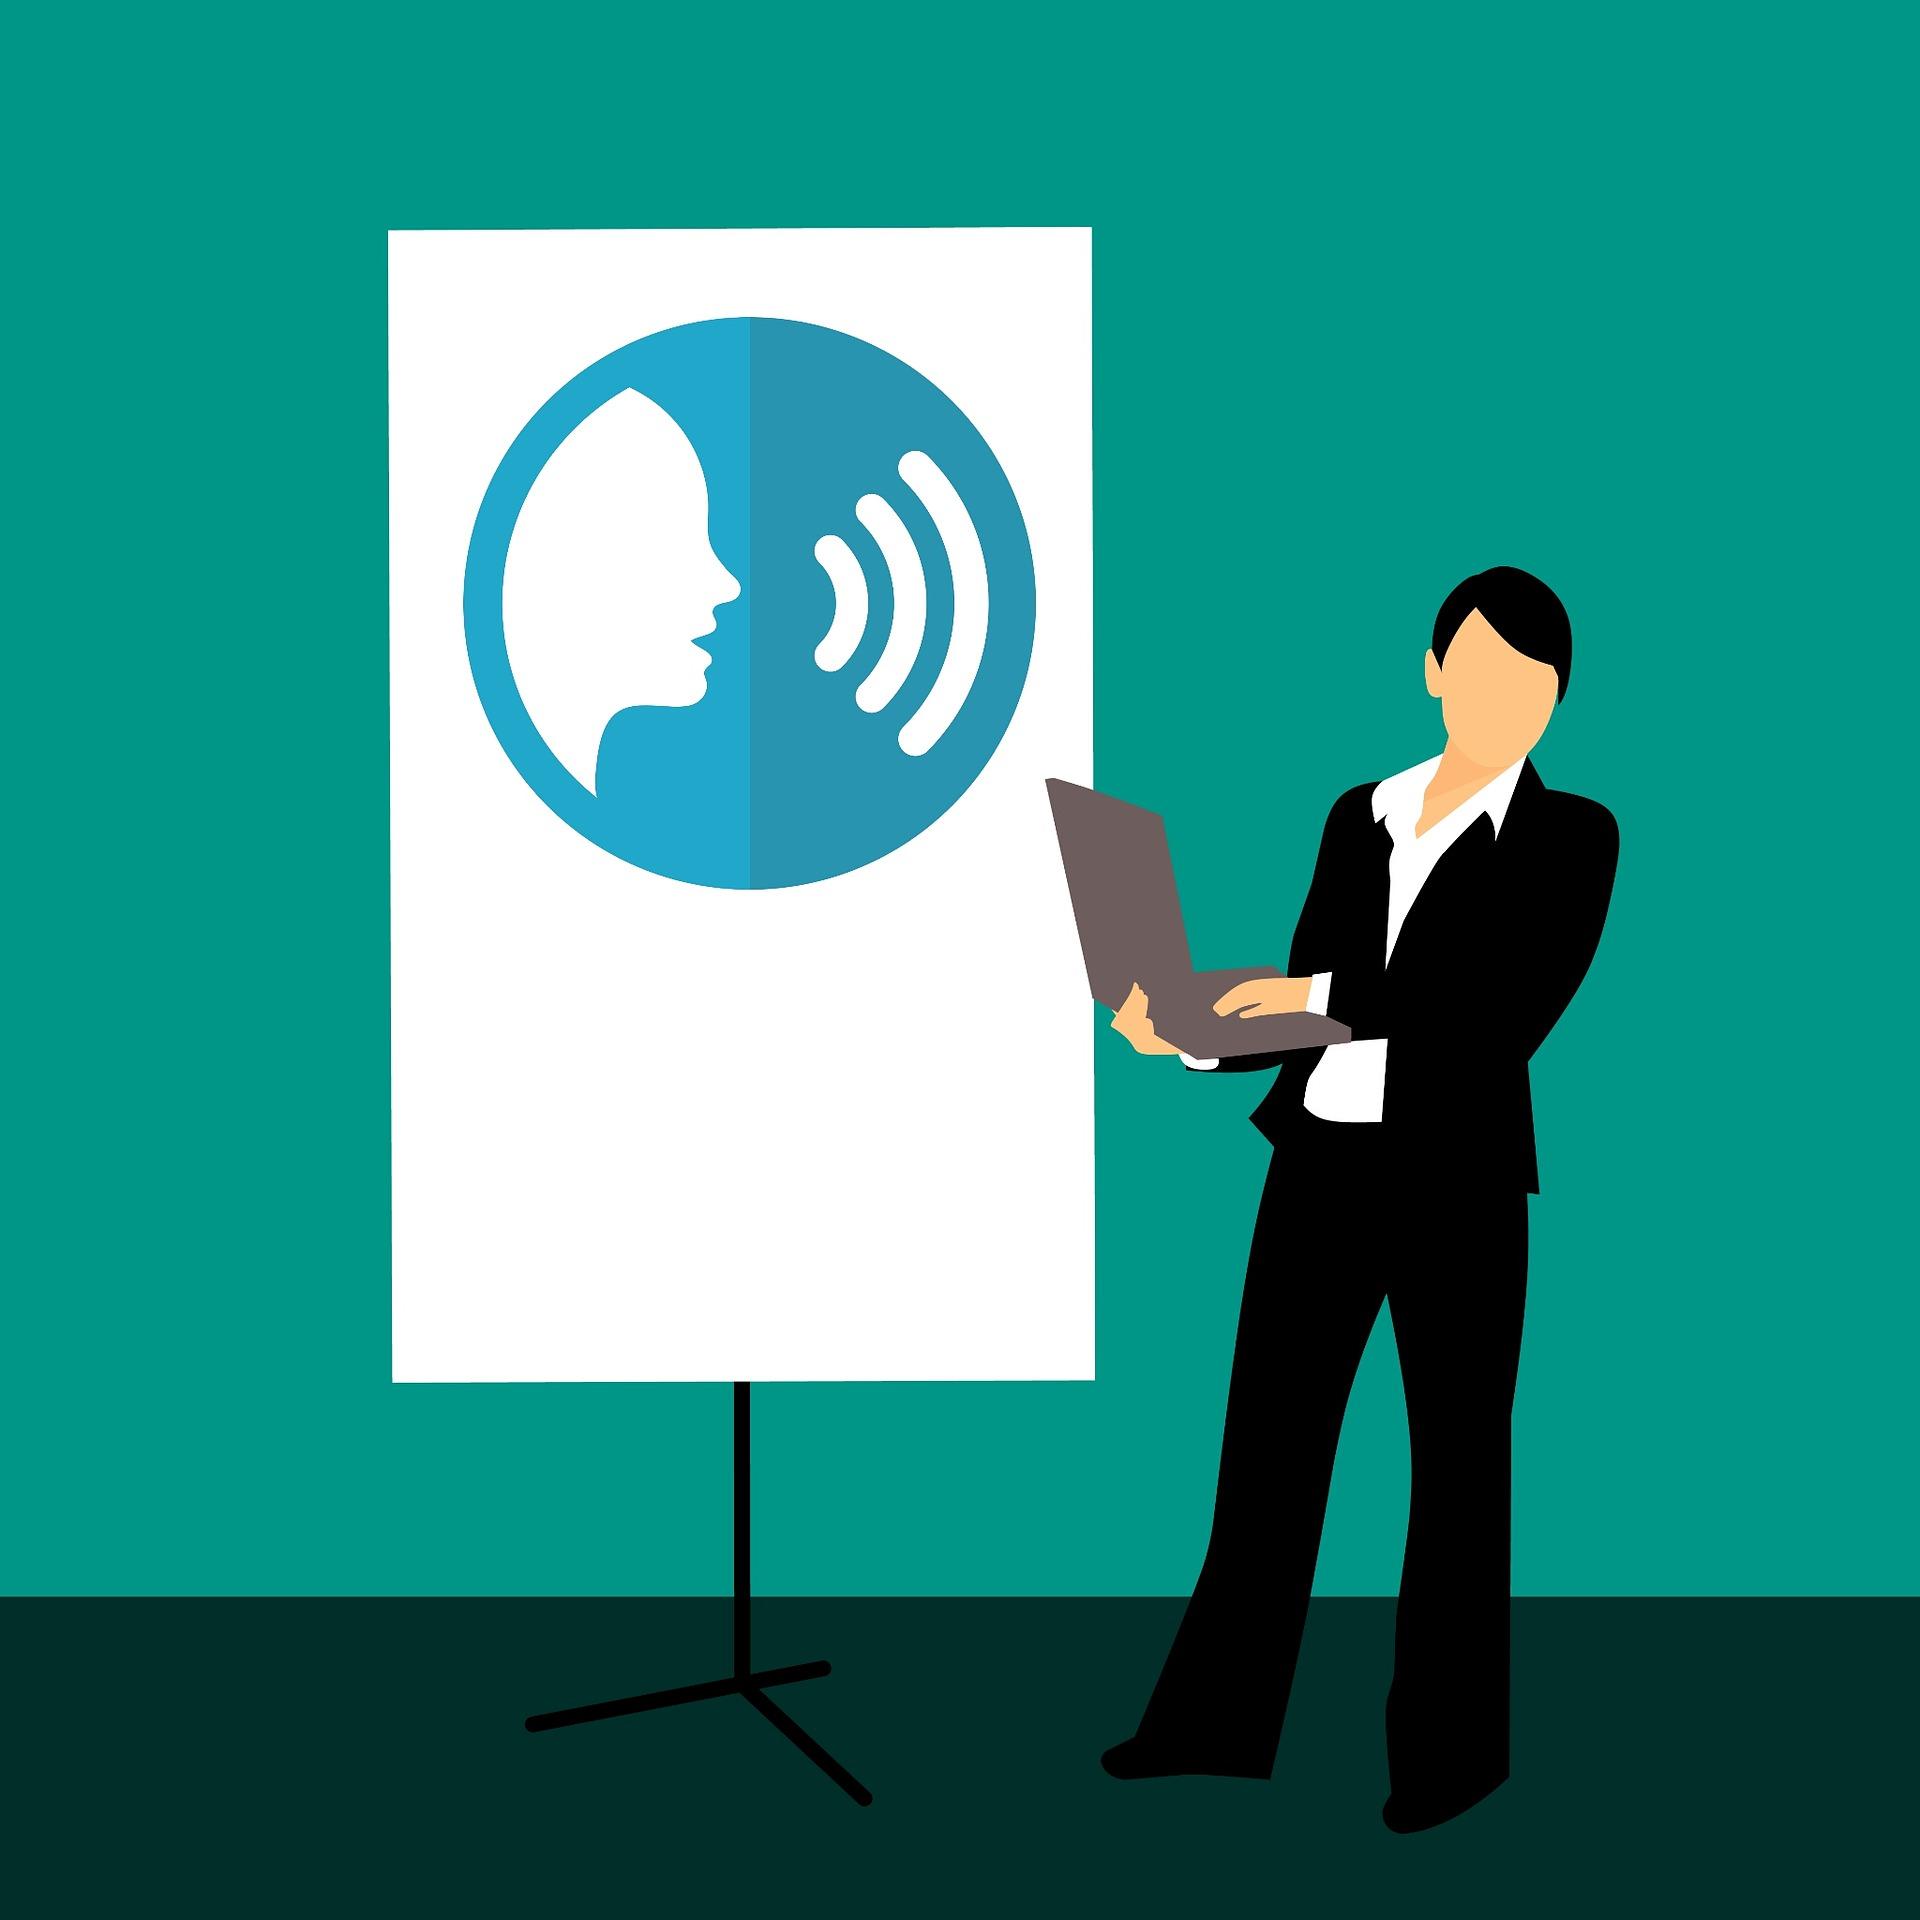 communication-skills-3224425_1920.jpg